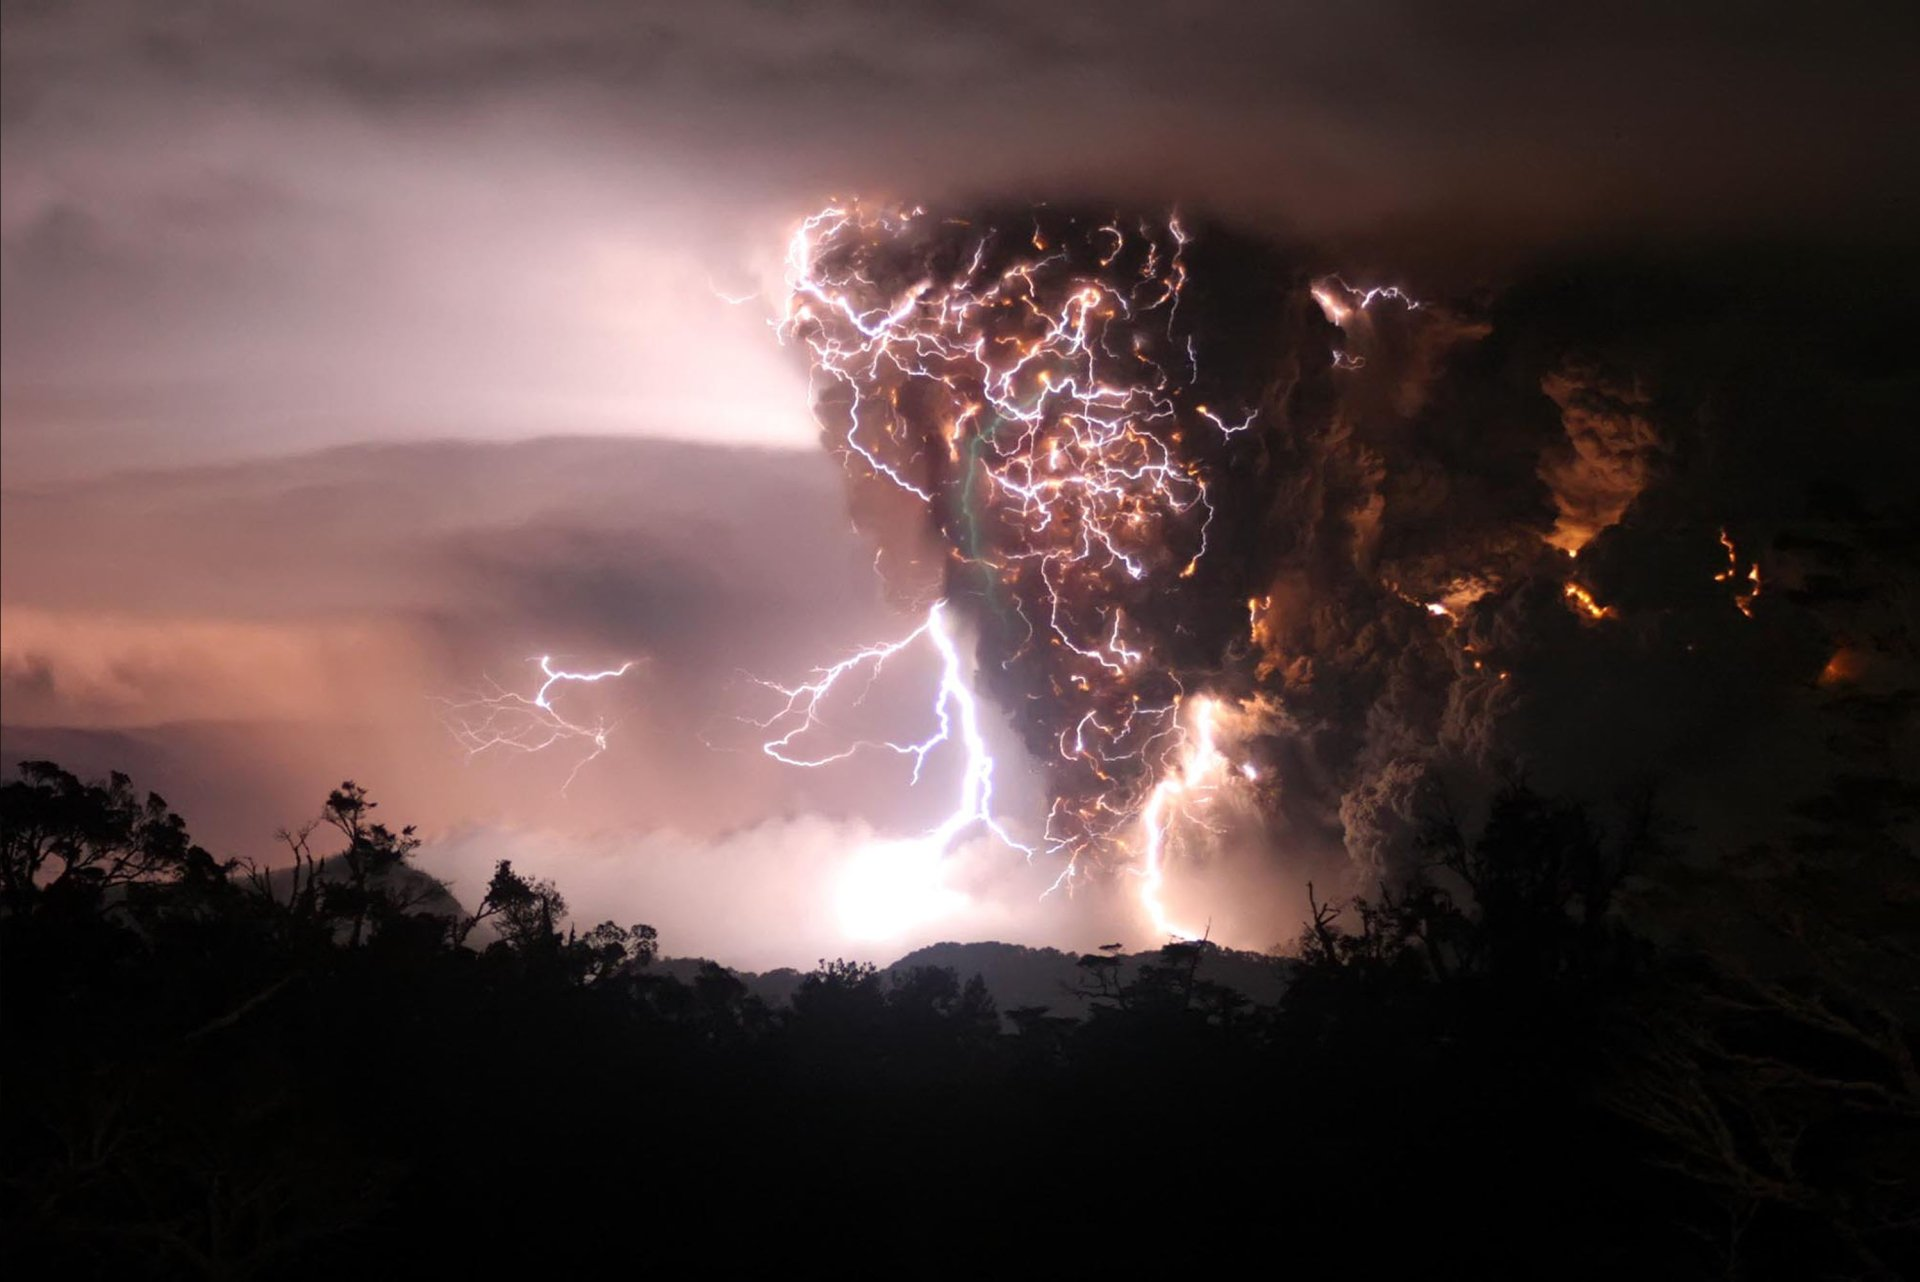 Fotografía - Relámpago  Volcán Eruption Fondo de Pantalla